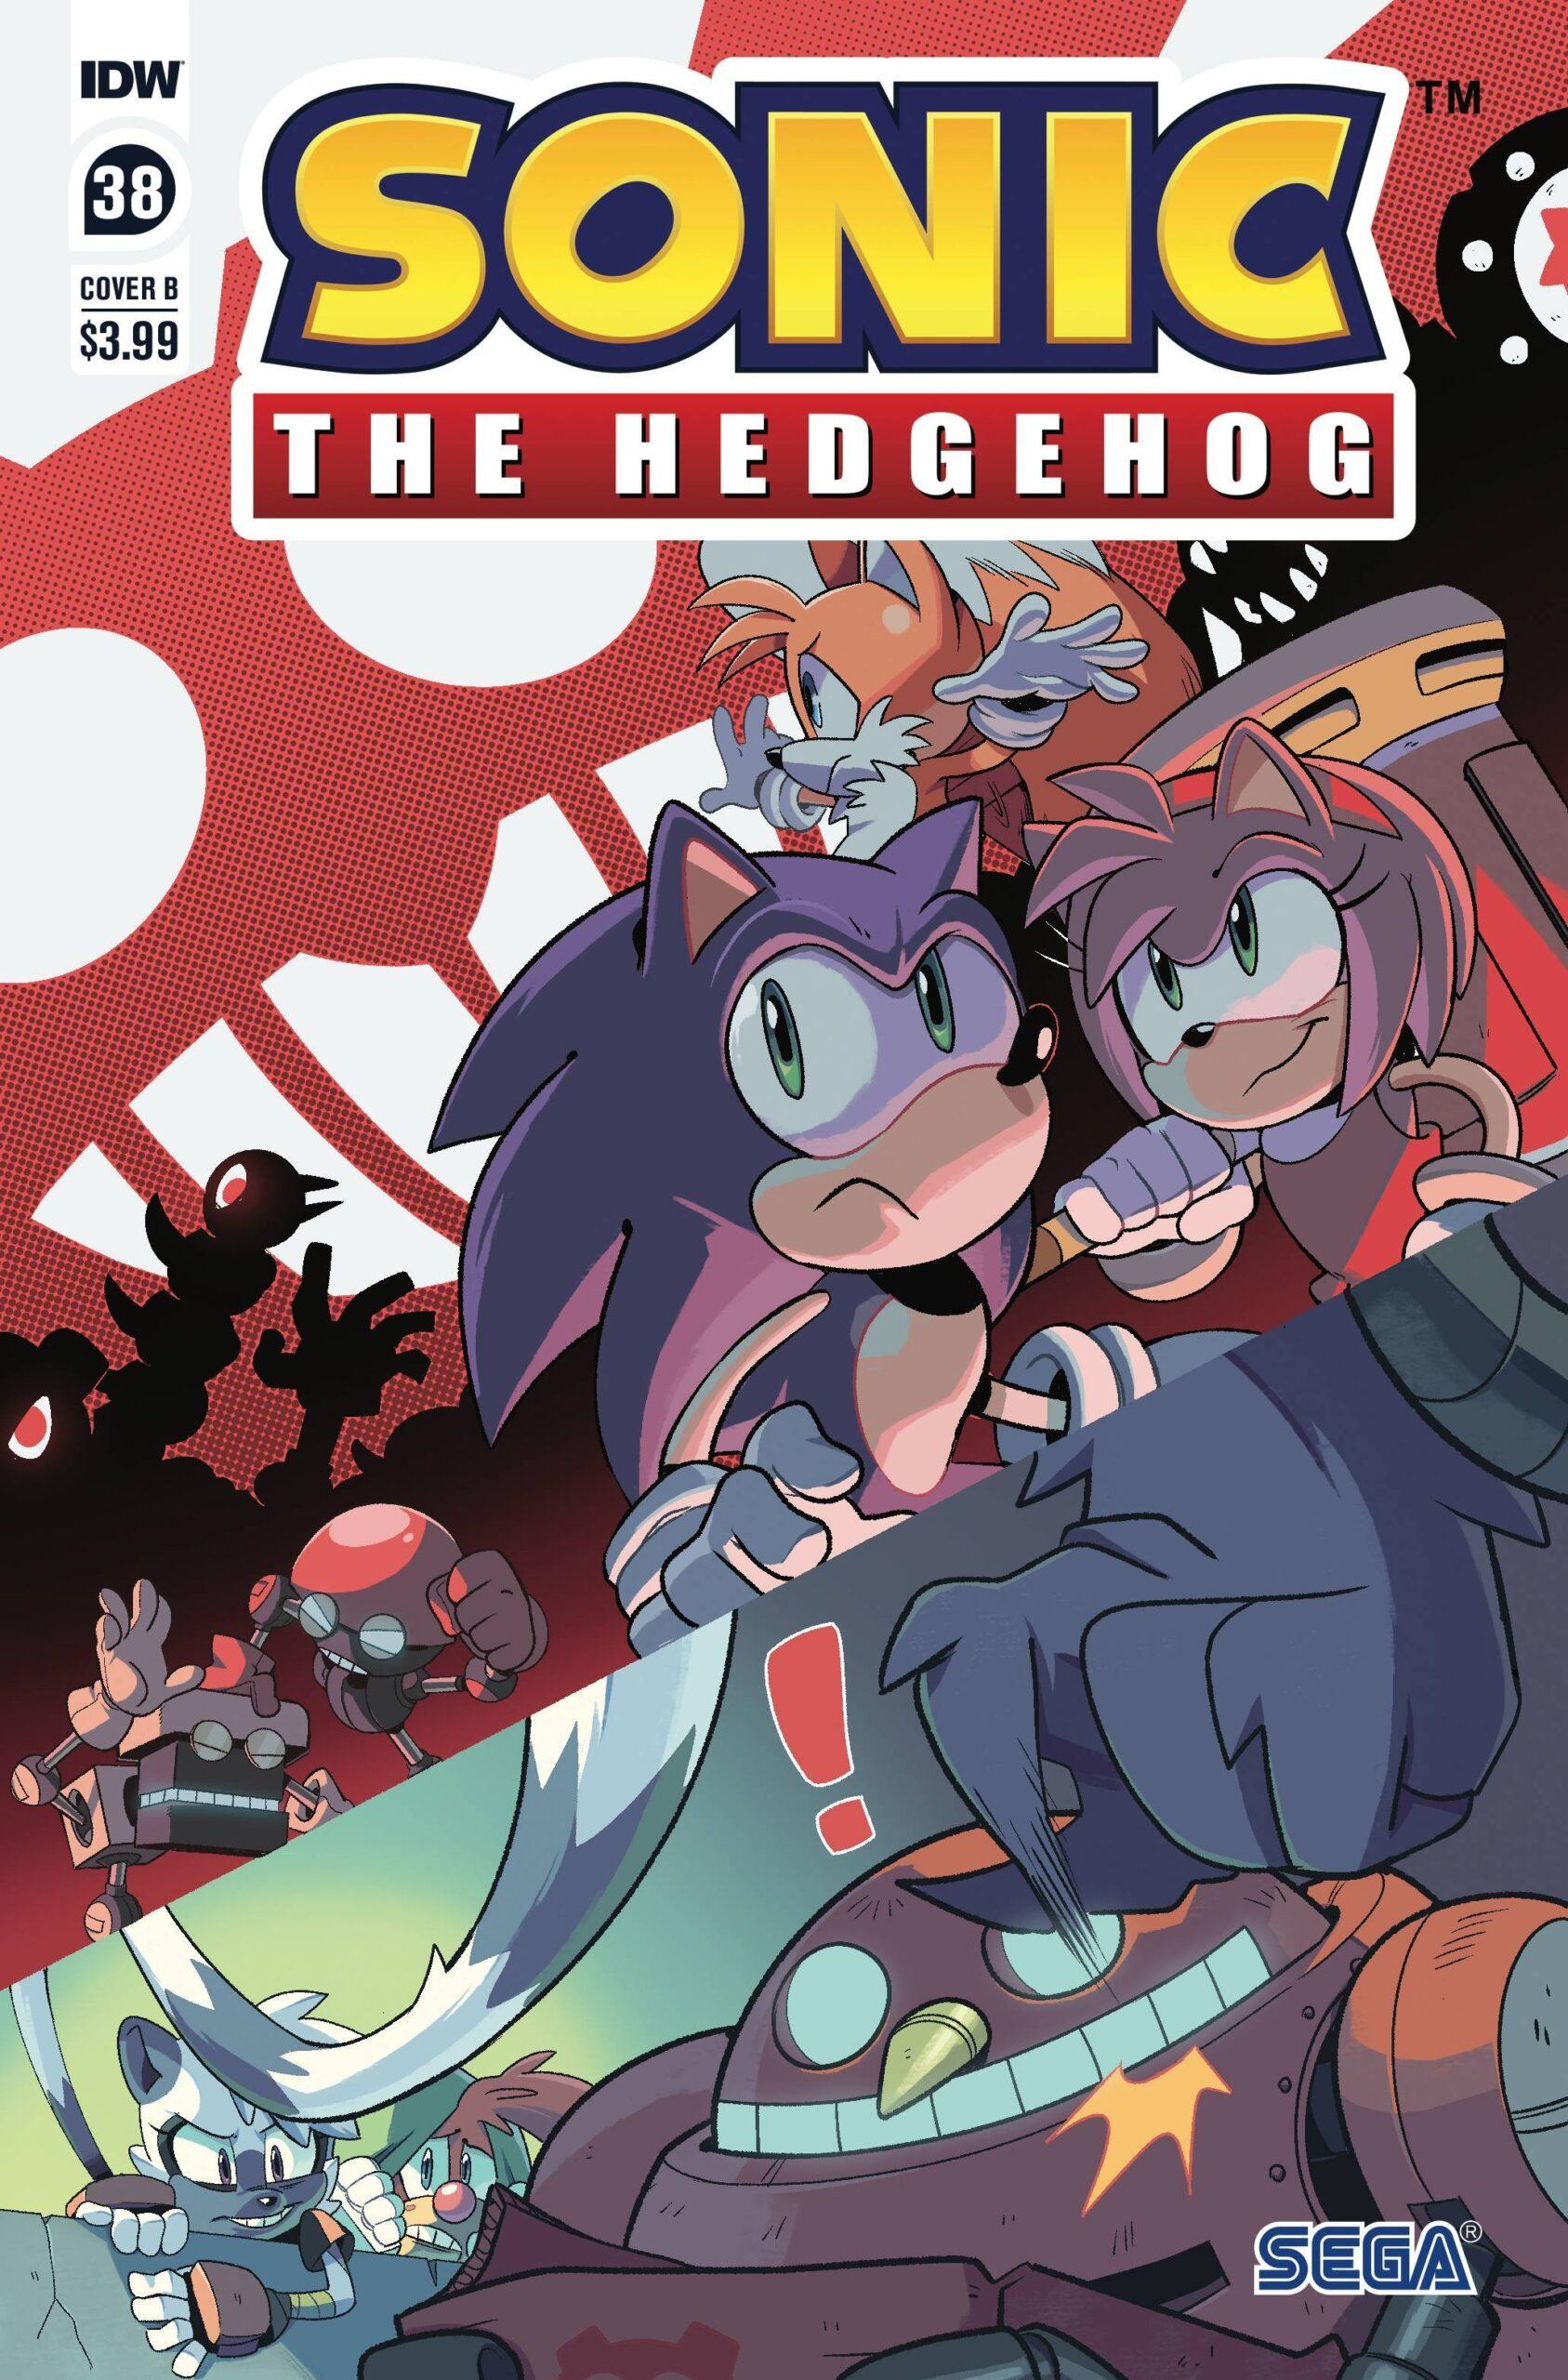 Sonic The Hedgehog #38 Cover B